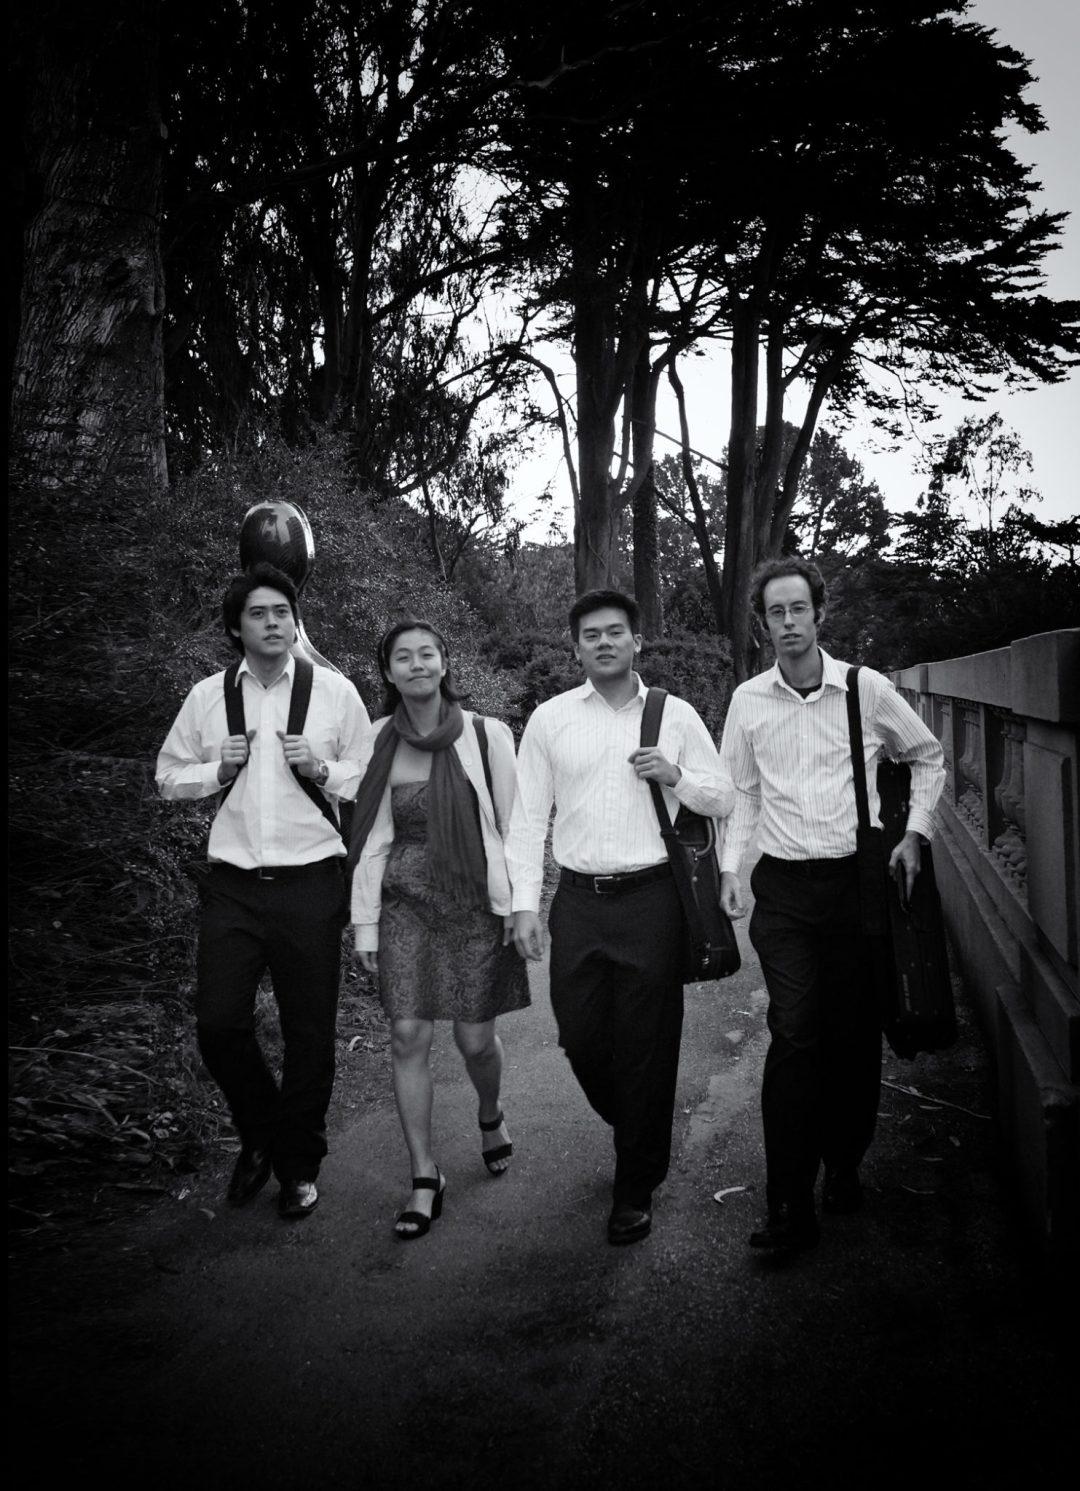 Telegraph-Quartet(L-R)Jeremiah-Shaw(cello)_Pei-Ling-Lin(viola)_Eric-Chin(violin)_Joseph-Maile(violin)_photo-Eric-Chin